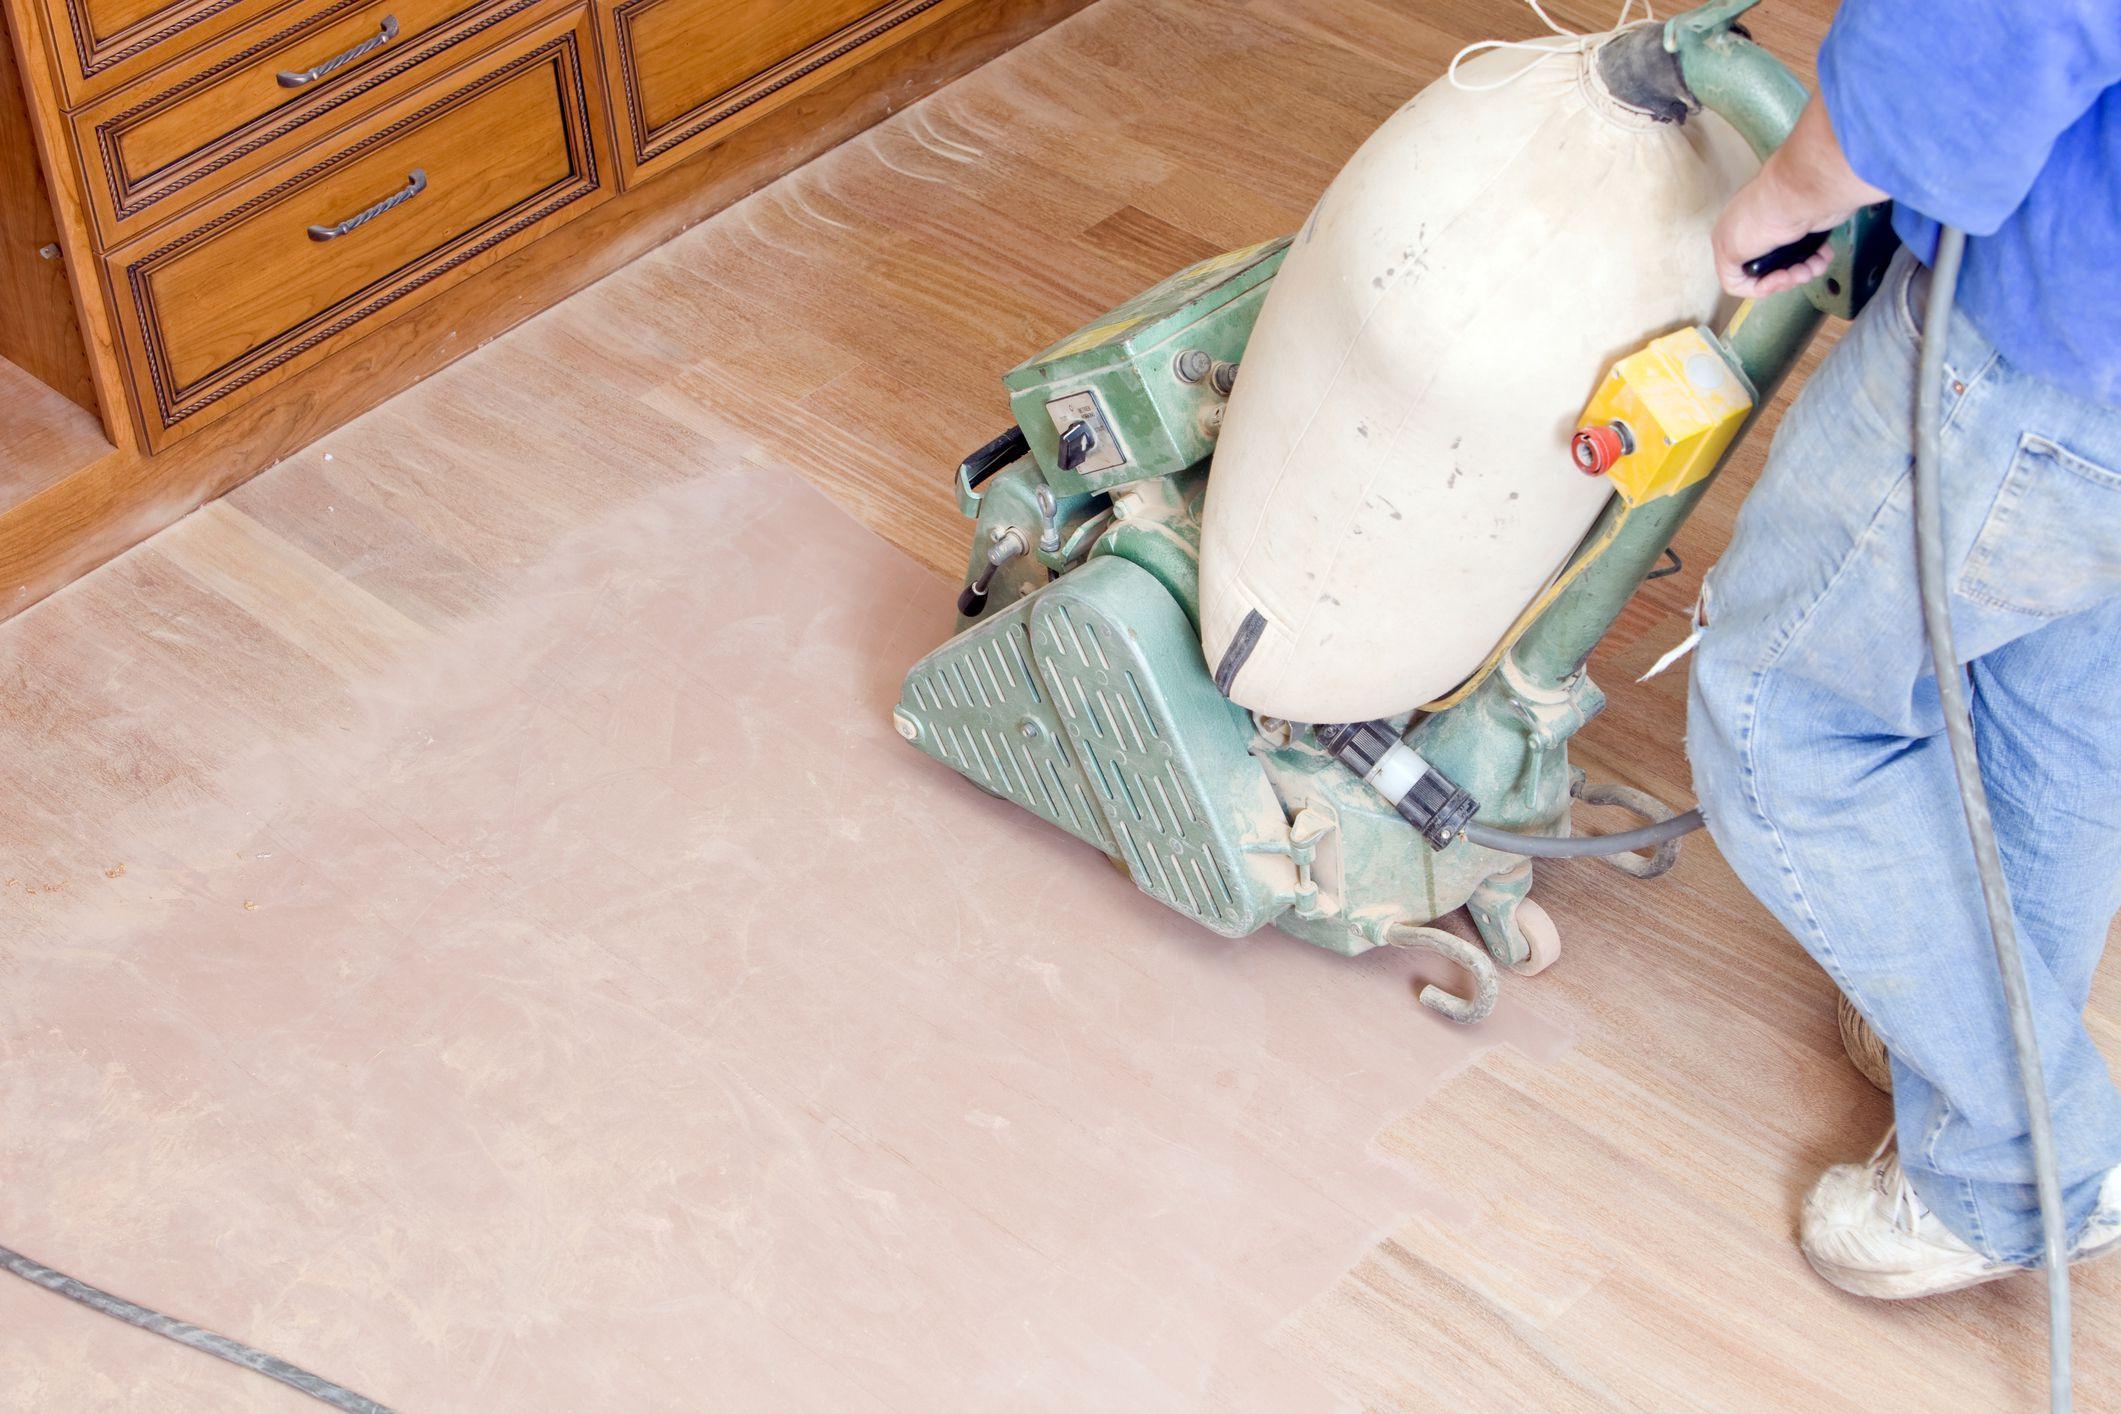 hardwood floor refinishing spokane wa of how to sand hardwood floors inside gettyimages 183776482 587b01375f9b584db3a41541